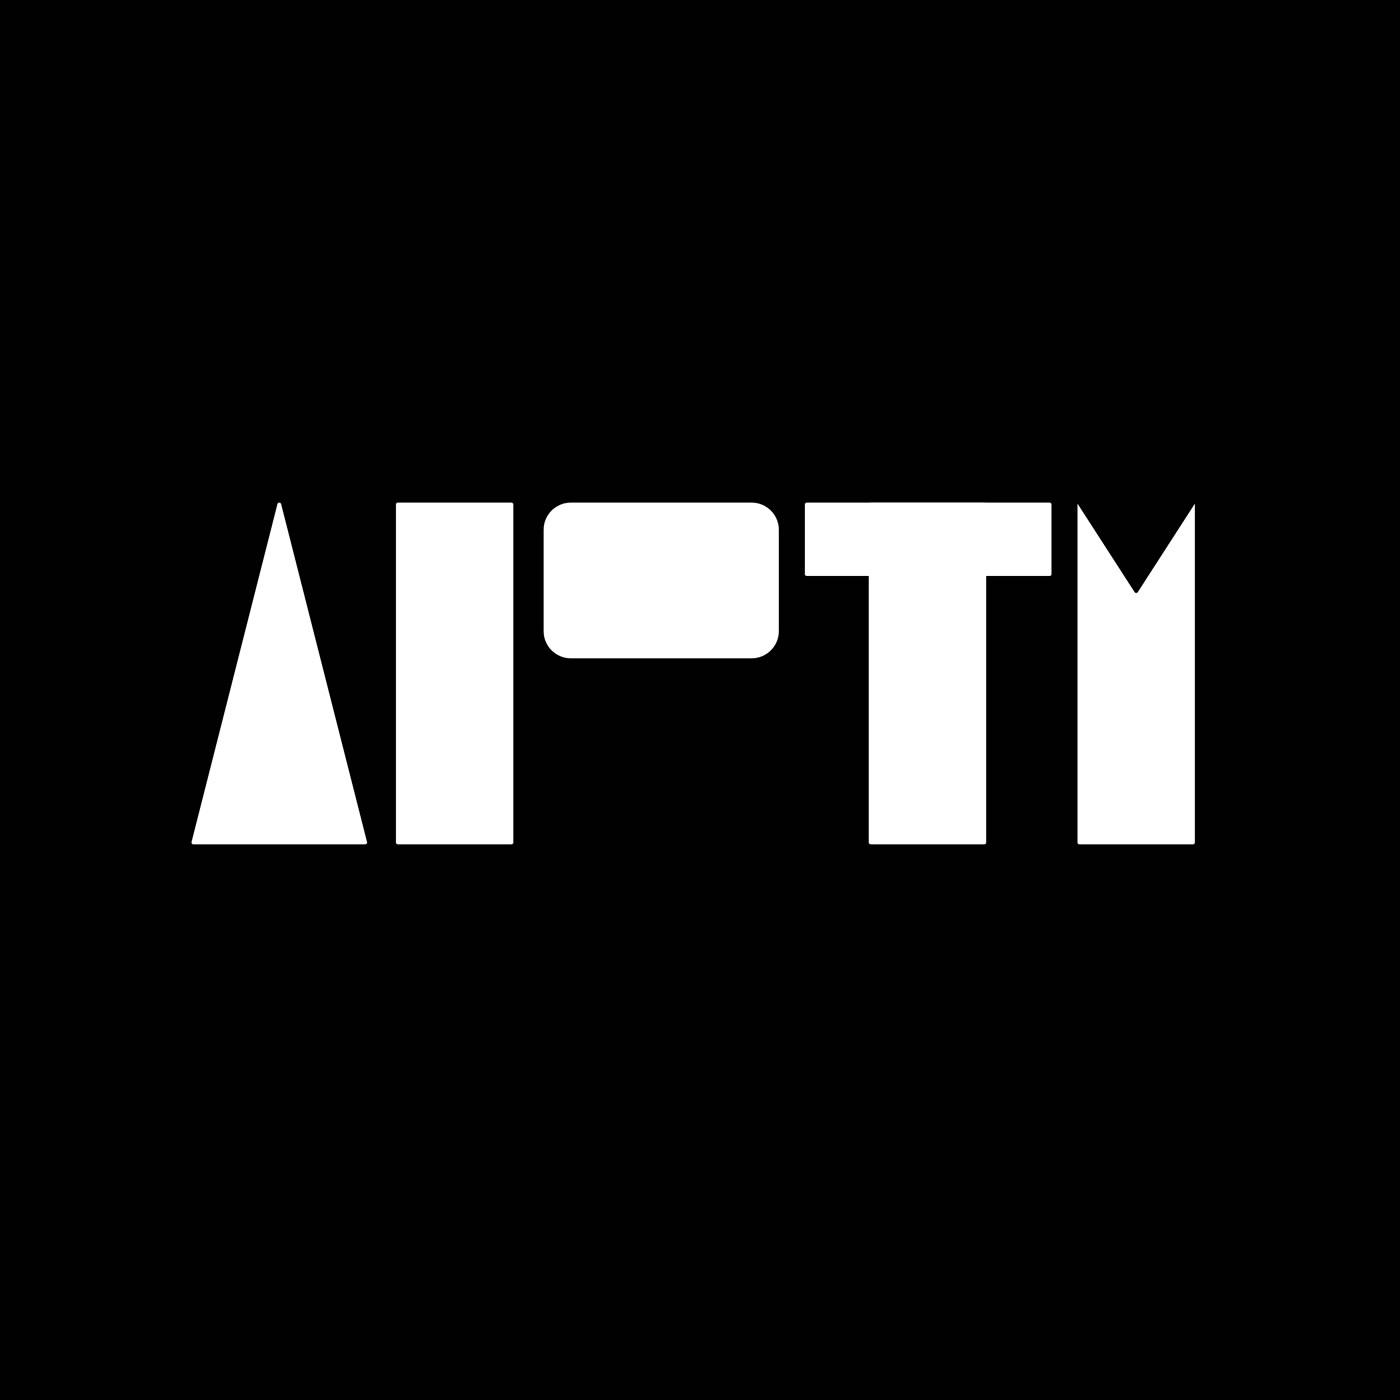 AIOTM - Video Series #2